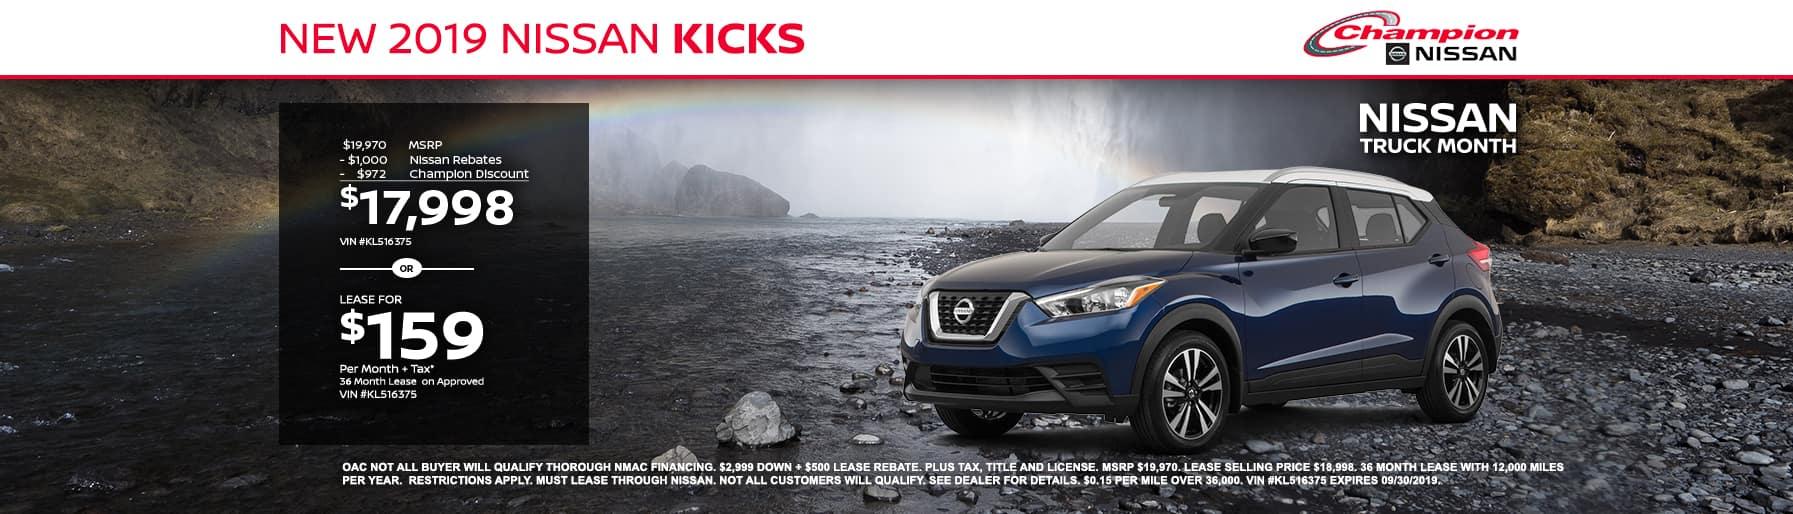 desktop TK 2019 Nissan Kicks